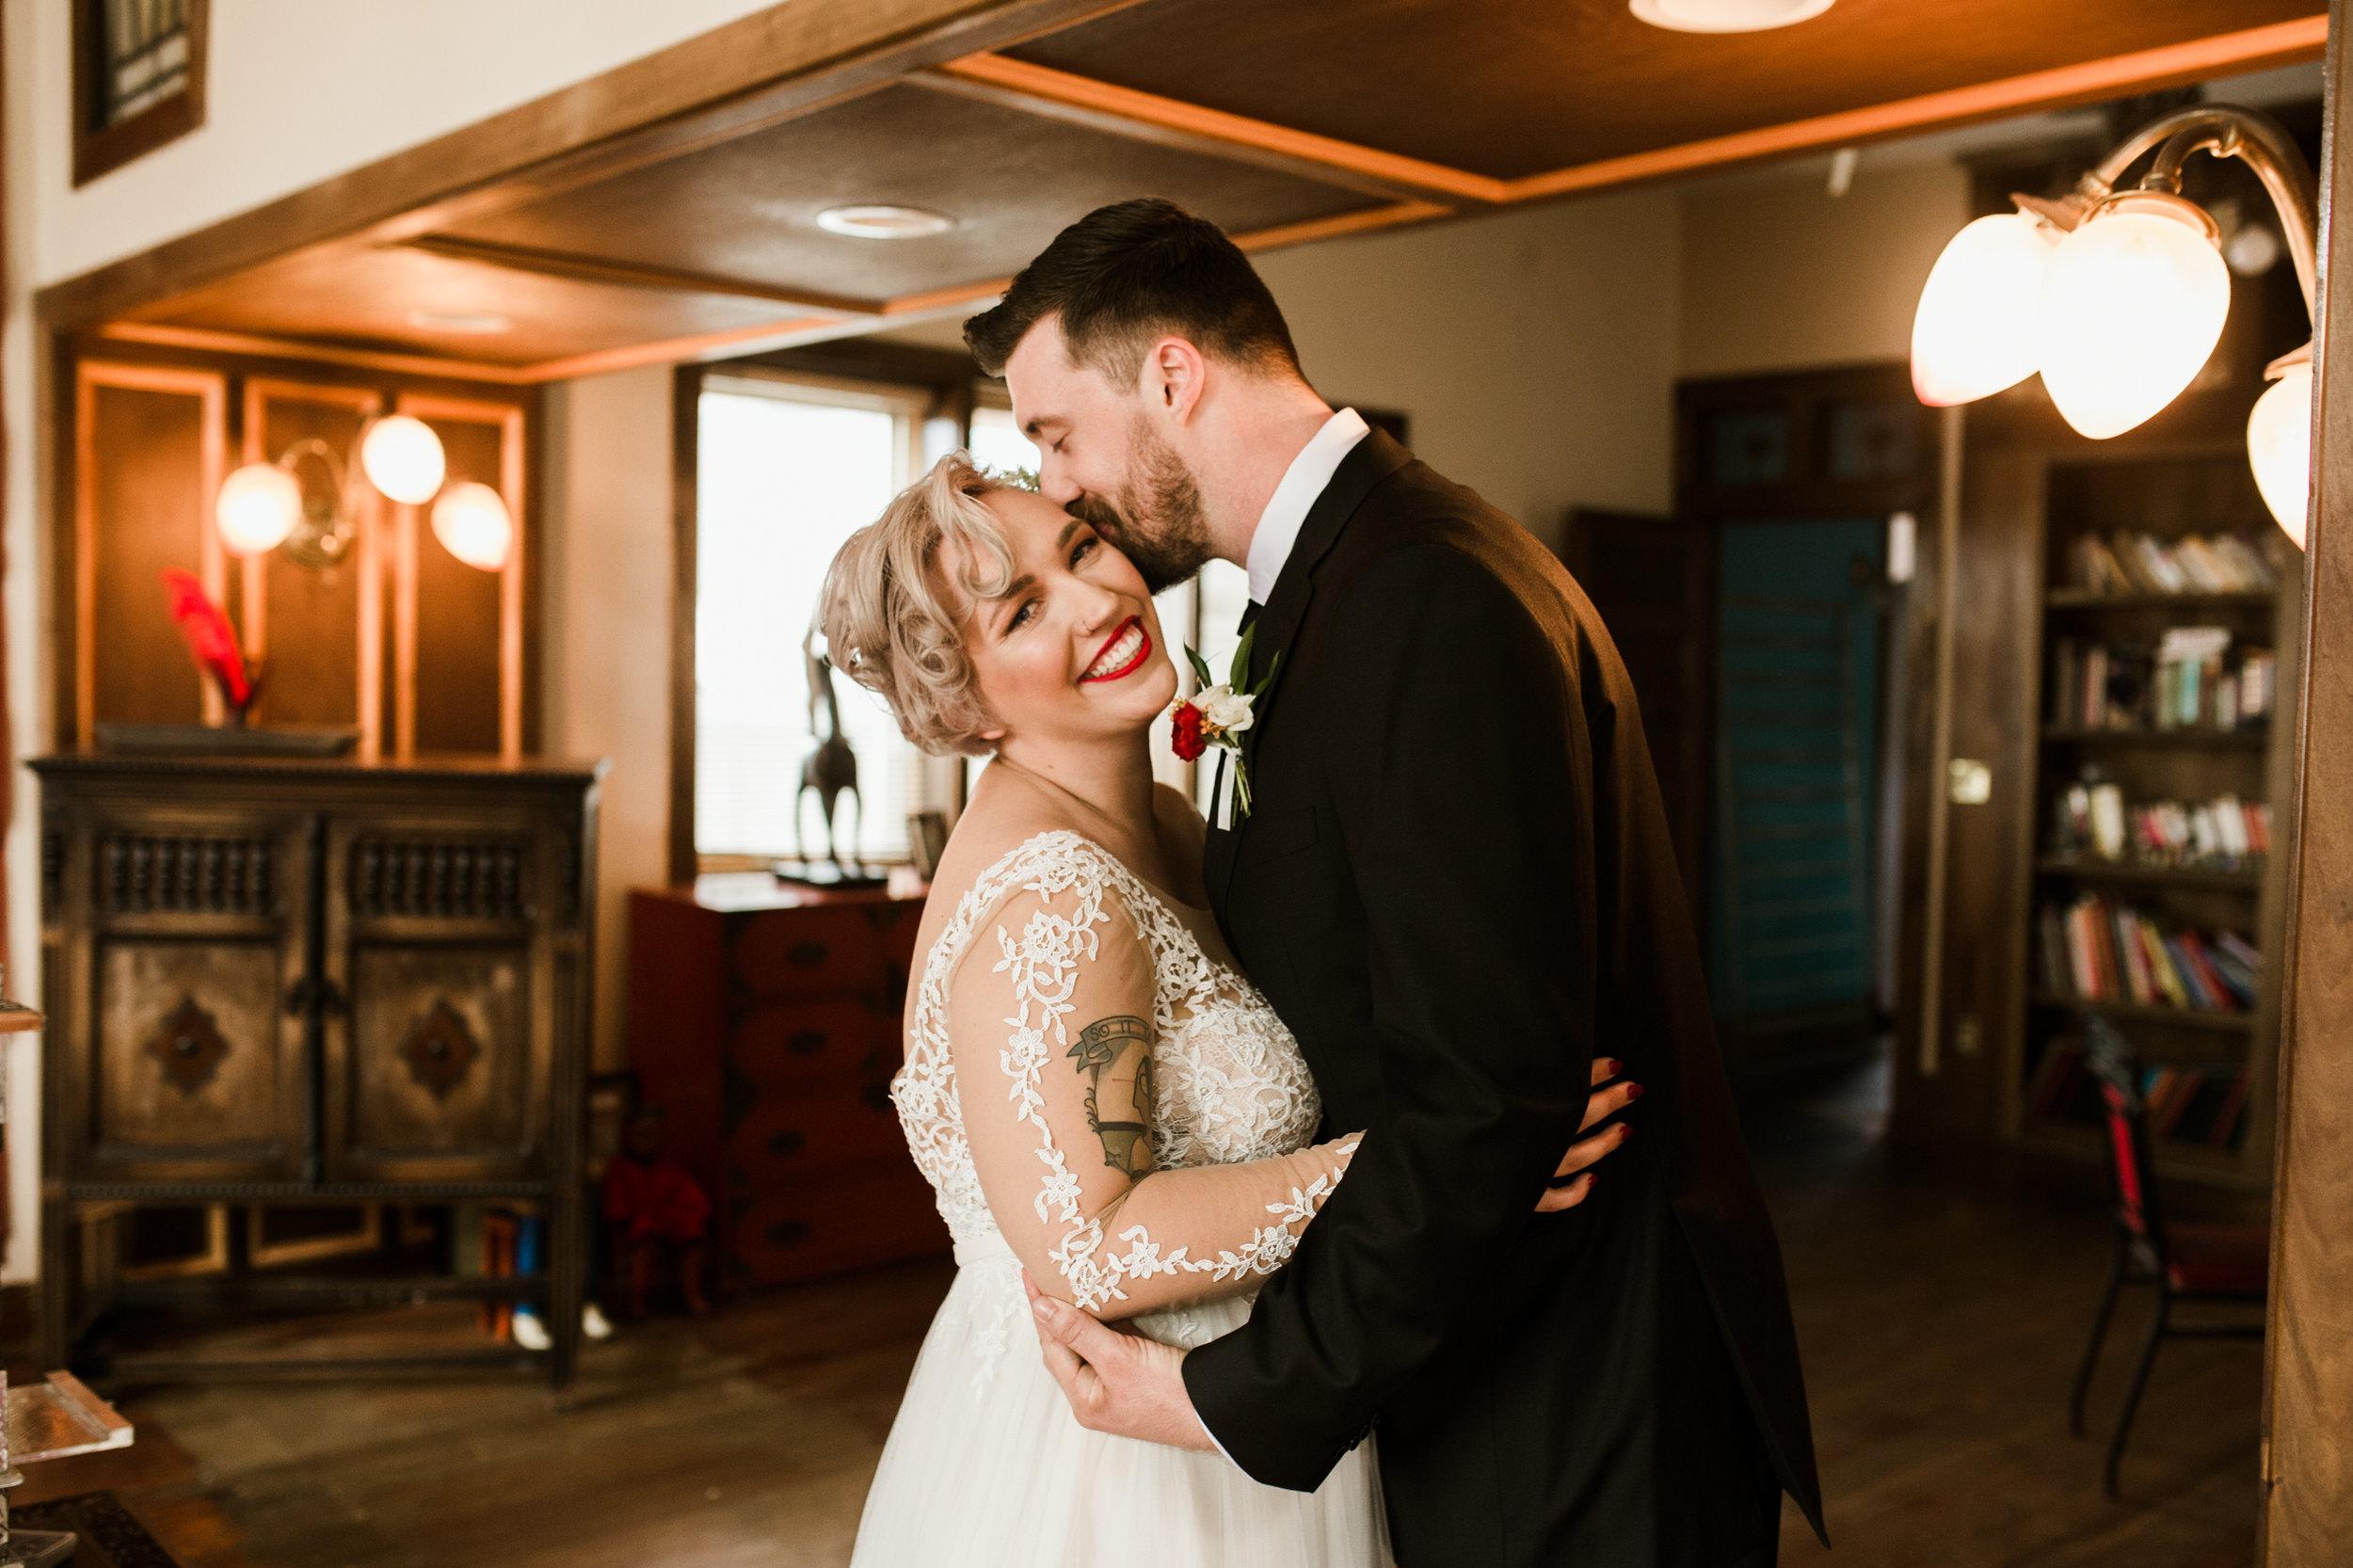 Kentucky Wedding Louisville Wedding Photographer 2018 Crystal Ludwick Photo Louisville Wedding Photographer Kentucky Wedding Photographer (90 of 105).jpg